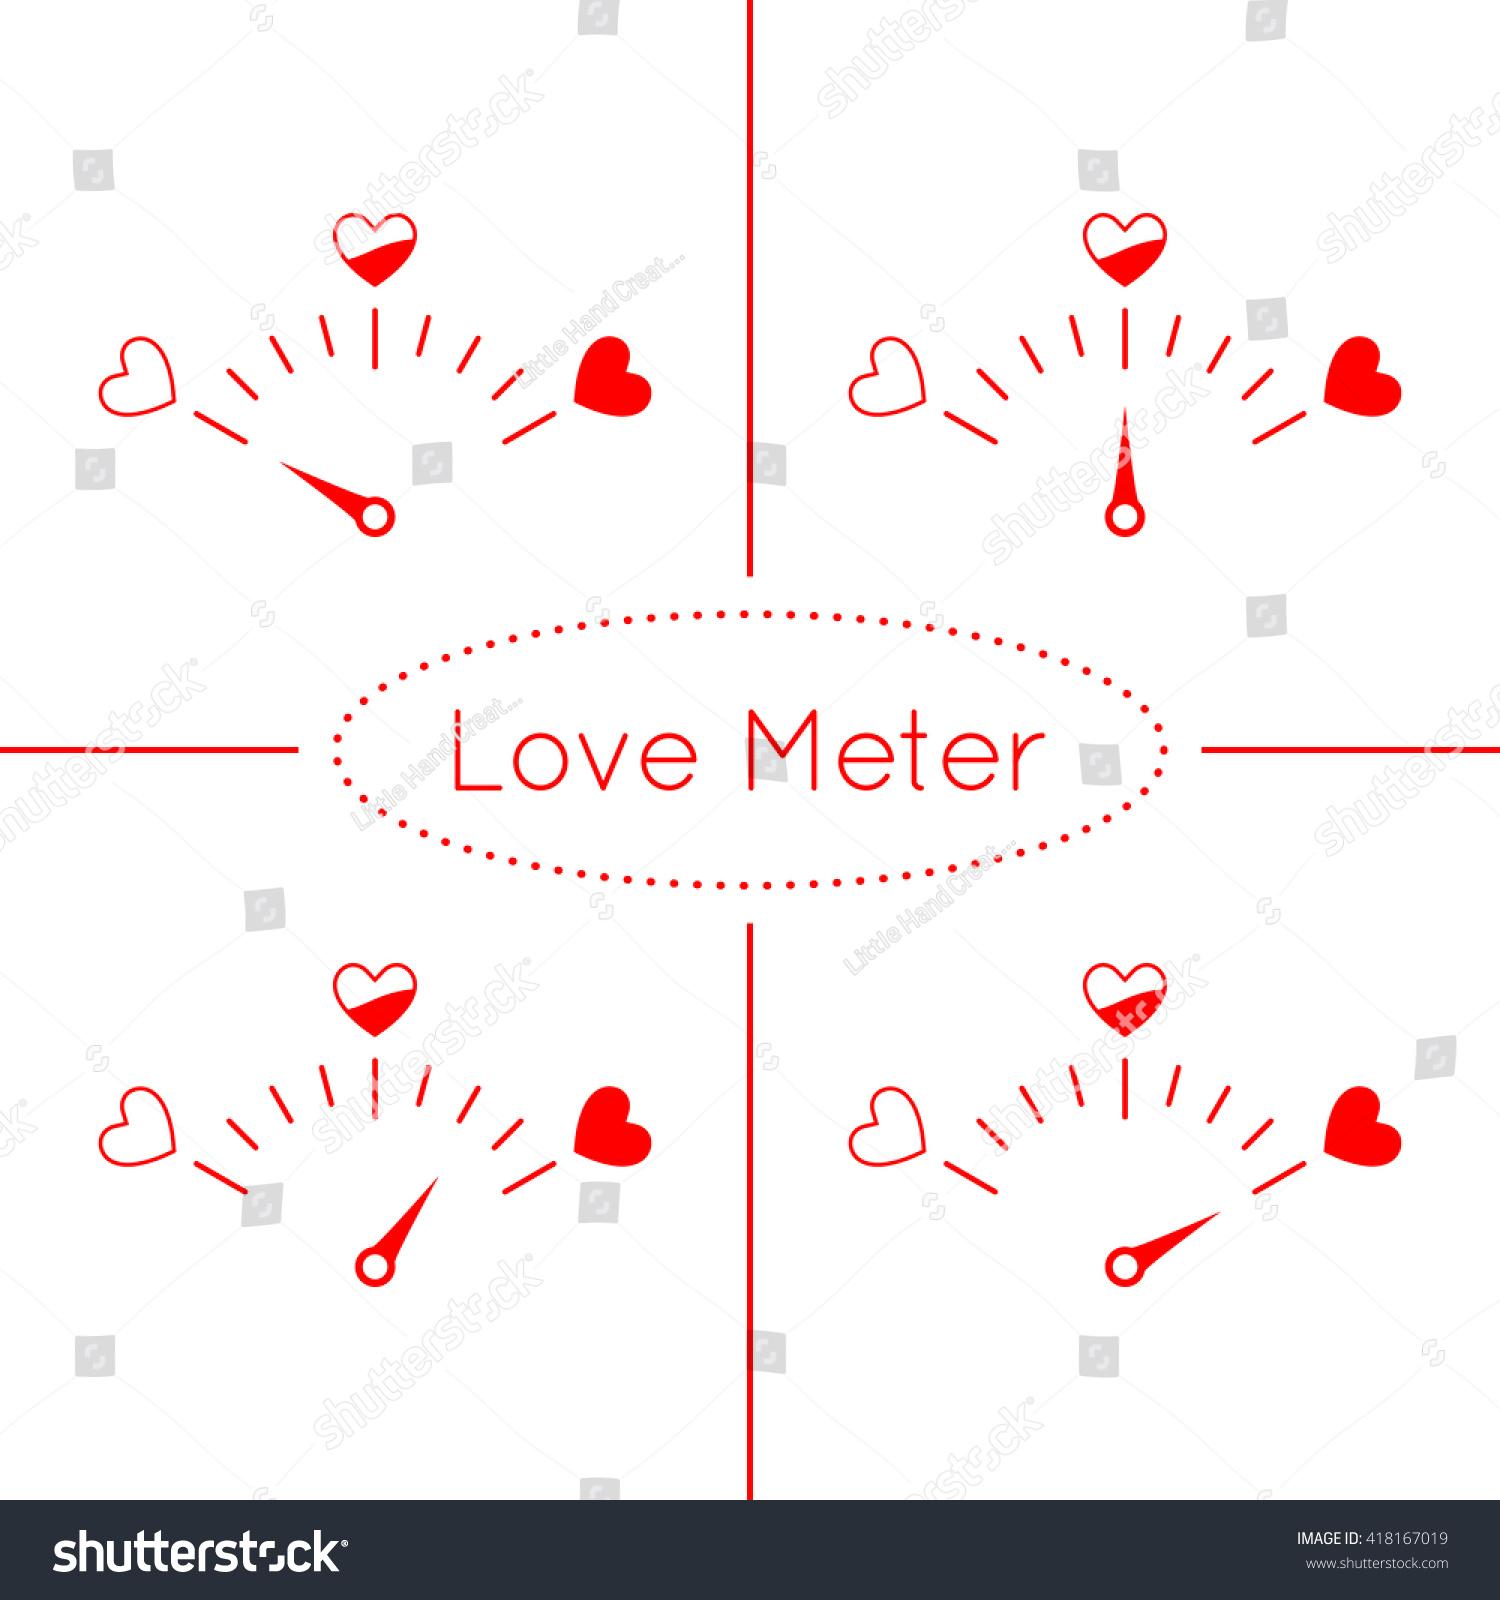 Love Meter Vector Set Heart Symbols Stock Vector Royalty Free